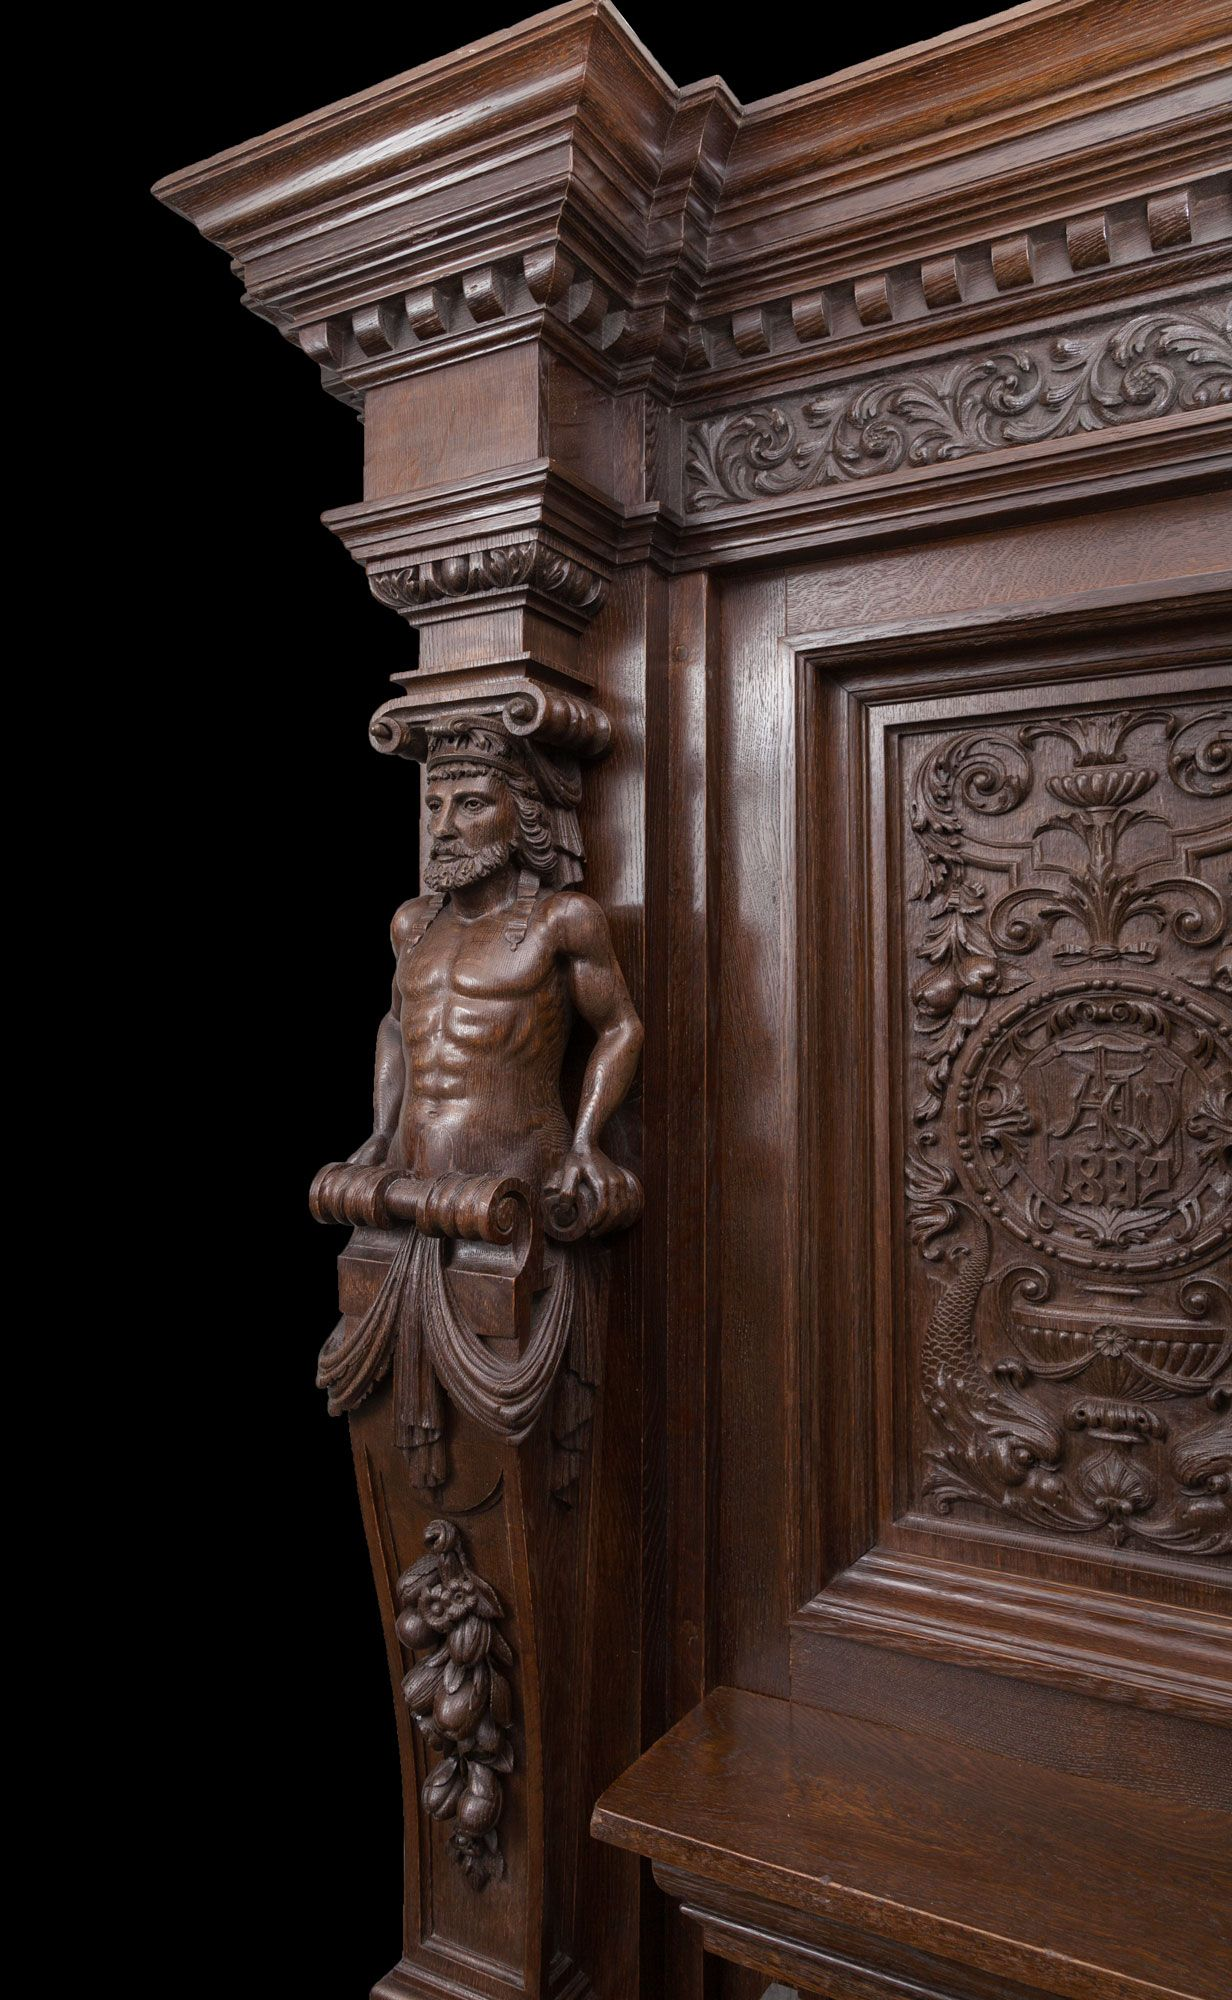 wooden mantel w105 from ryan u0026 smith ltd specialists in antique